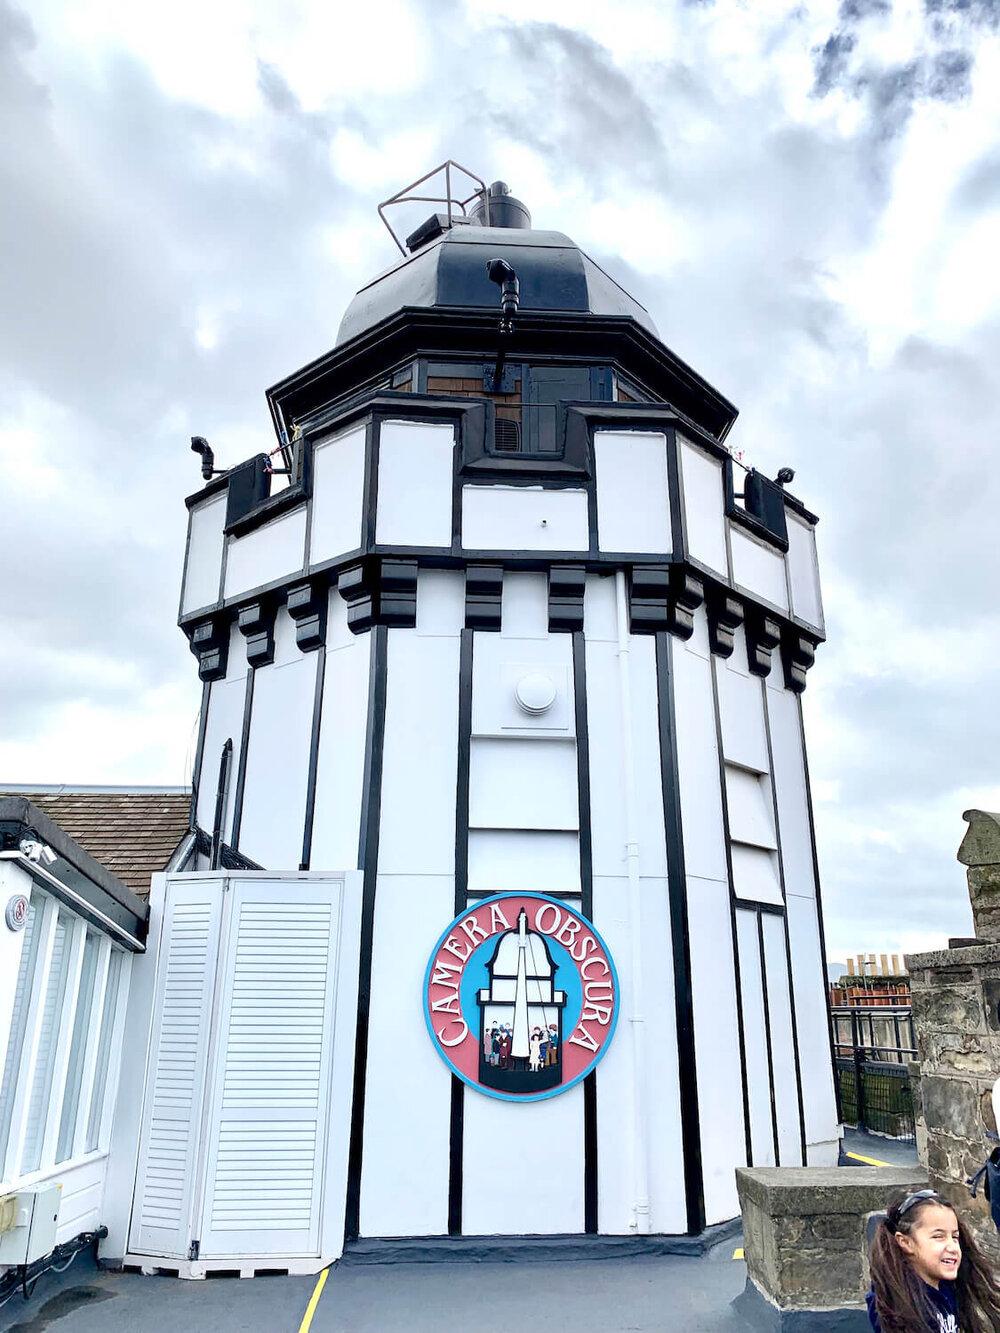 from Camera Obscura & World Of Illusions, Edinburgh. Visit  www.Camera-obscura.co.uk